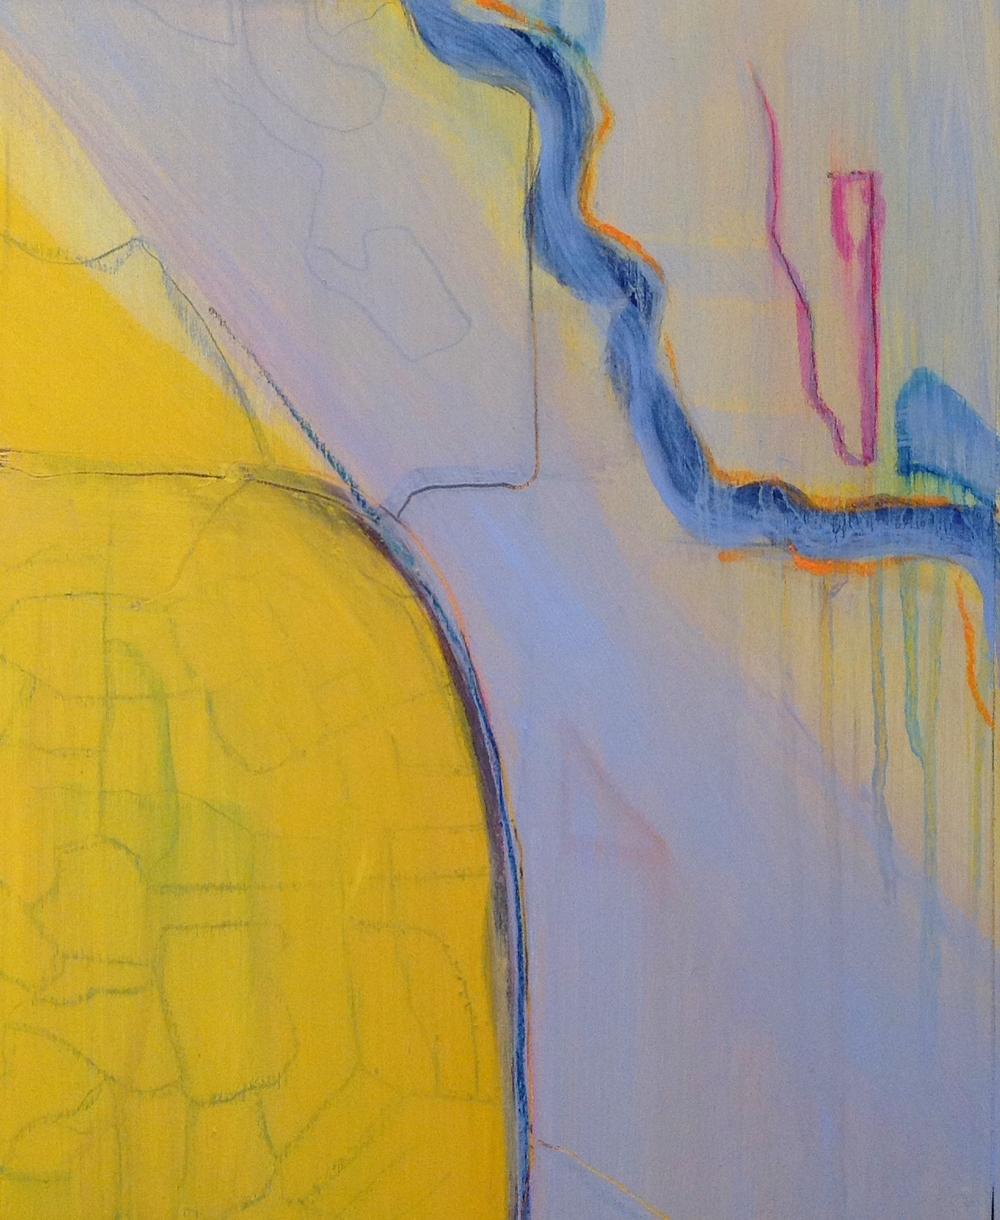 Artmap Section #27